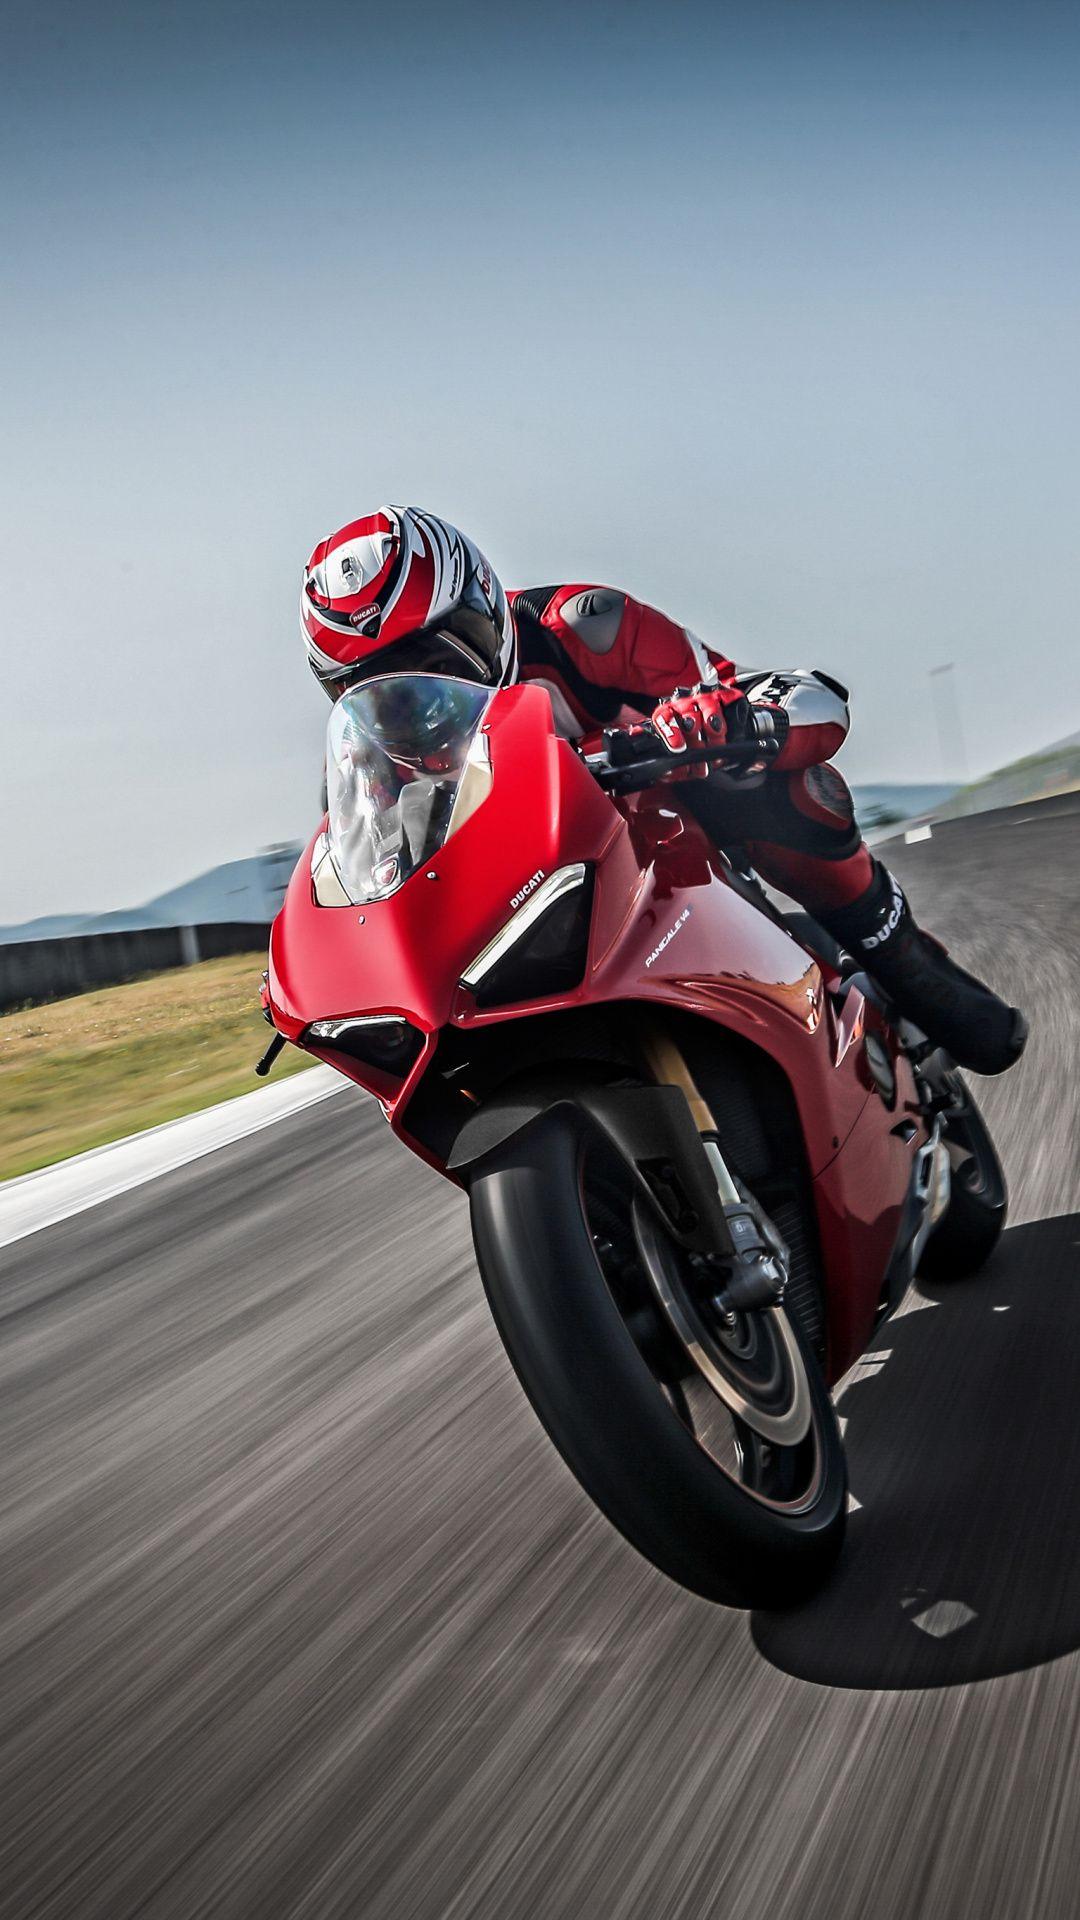 Ducati Panigale V4 Speciale Ducati Panigale Racing Bikes Ducati